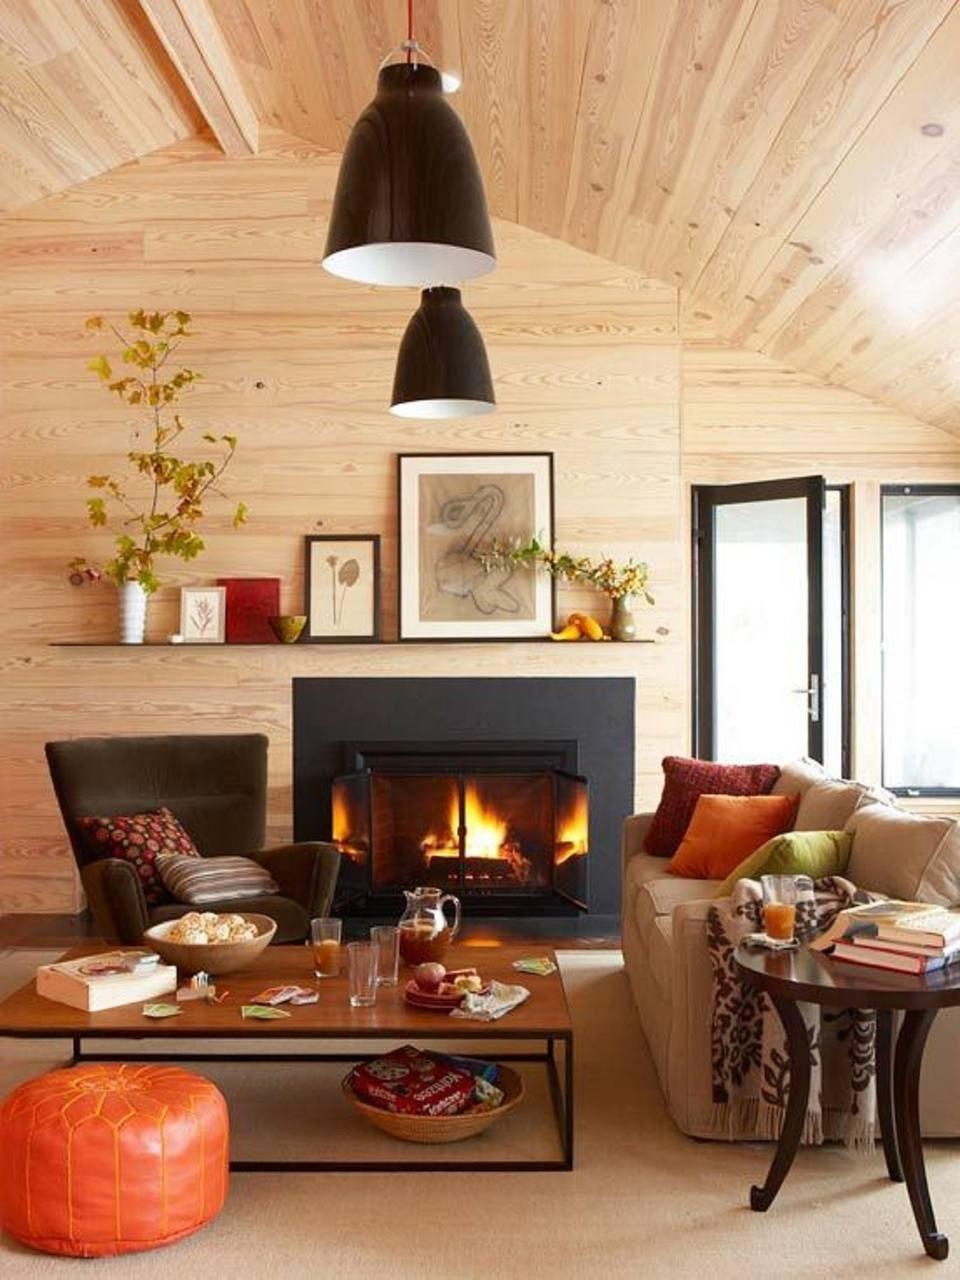 Living Room Art Decor Ideas 24 Creative Fall Harvest Home Decor Ideas